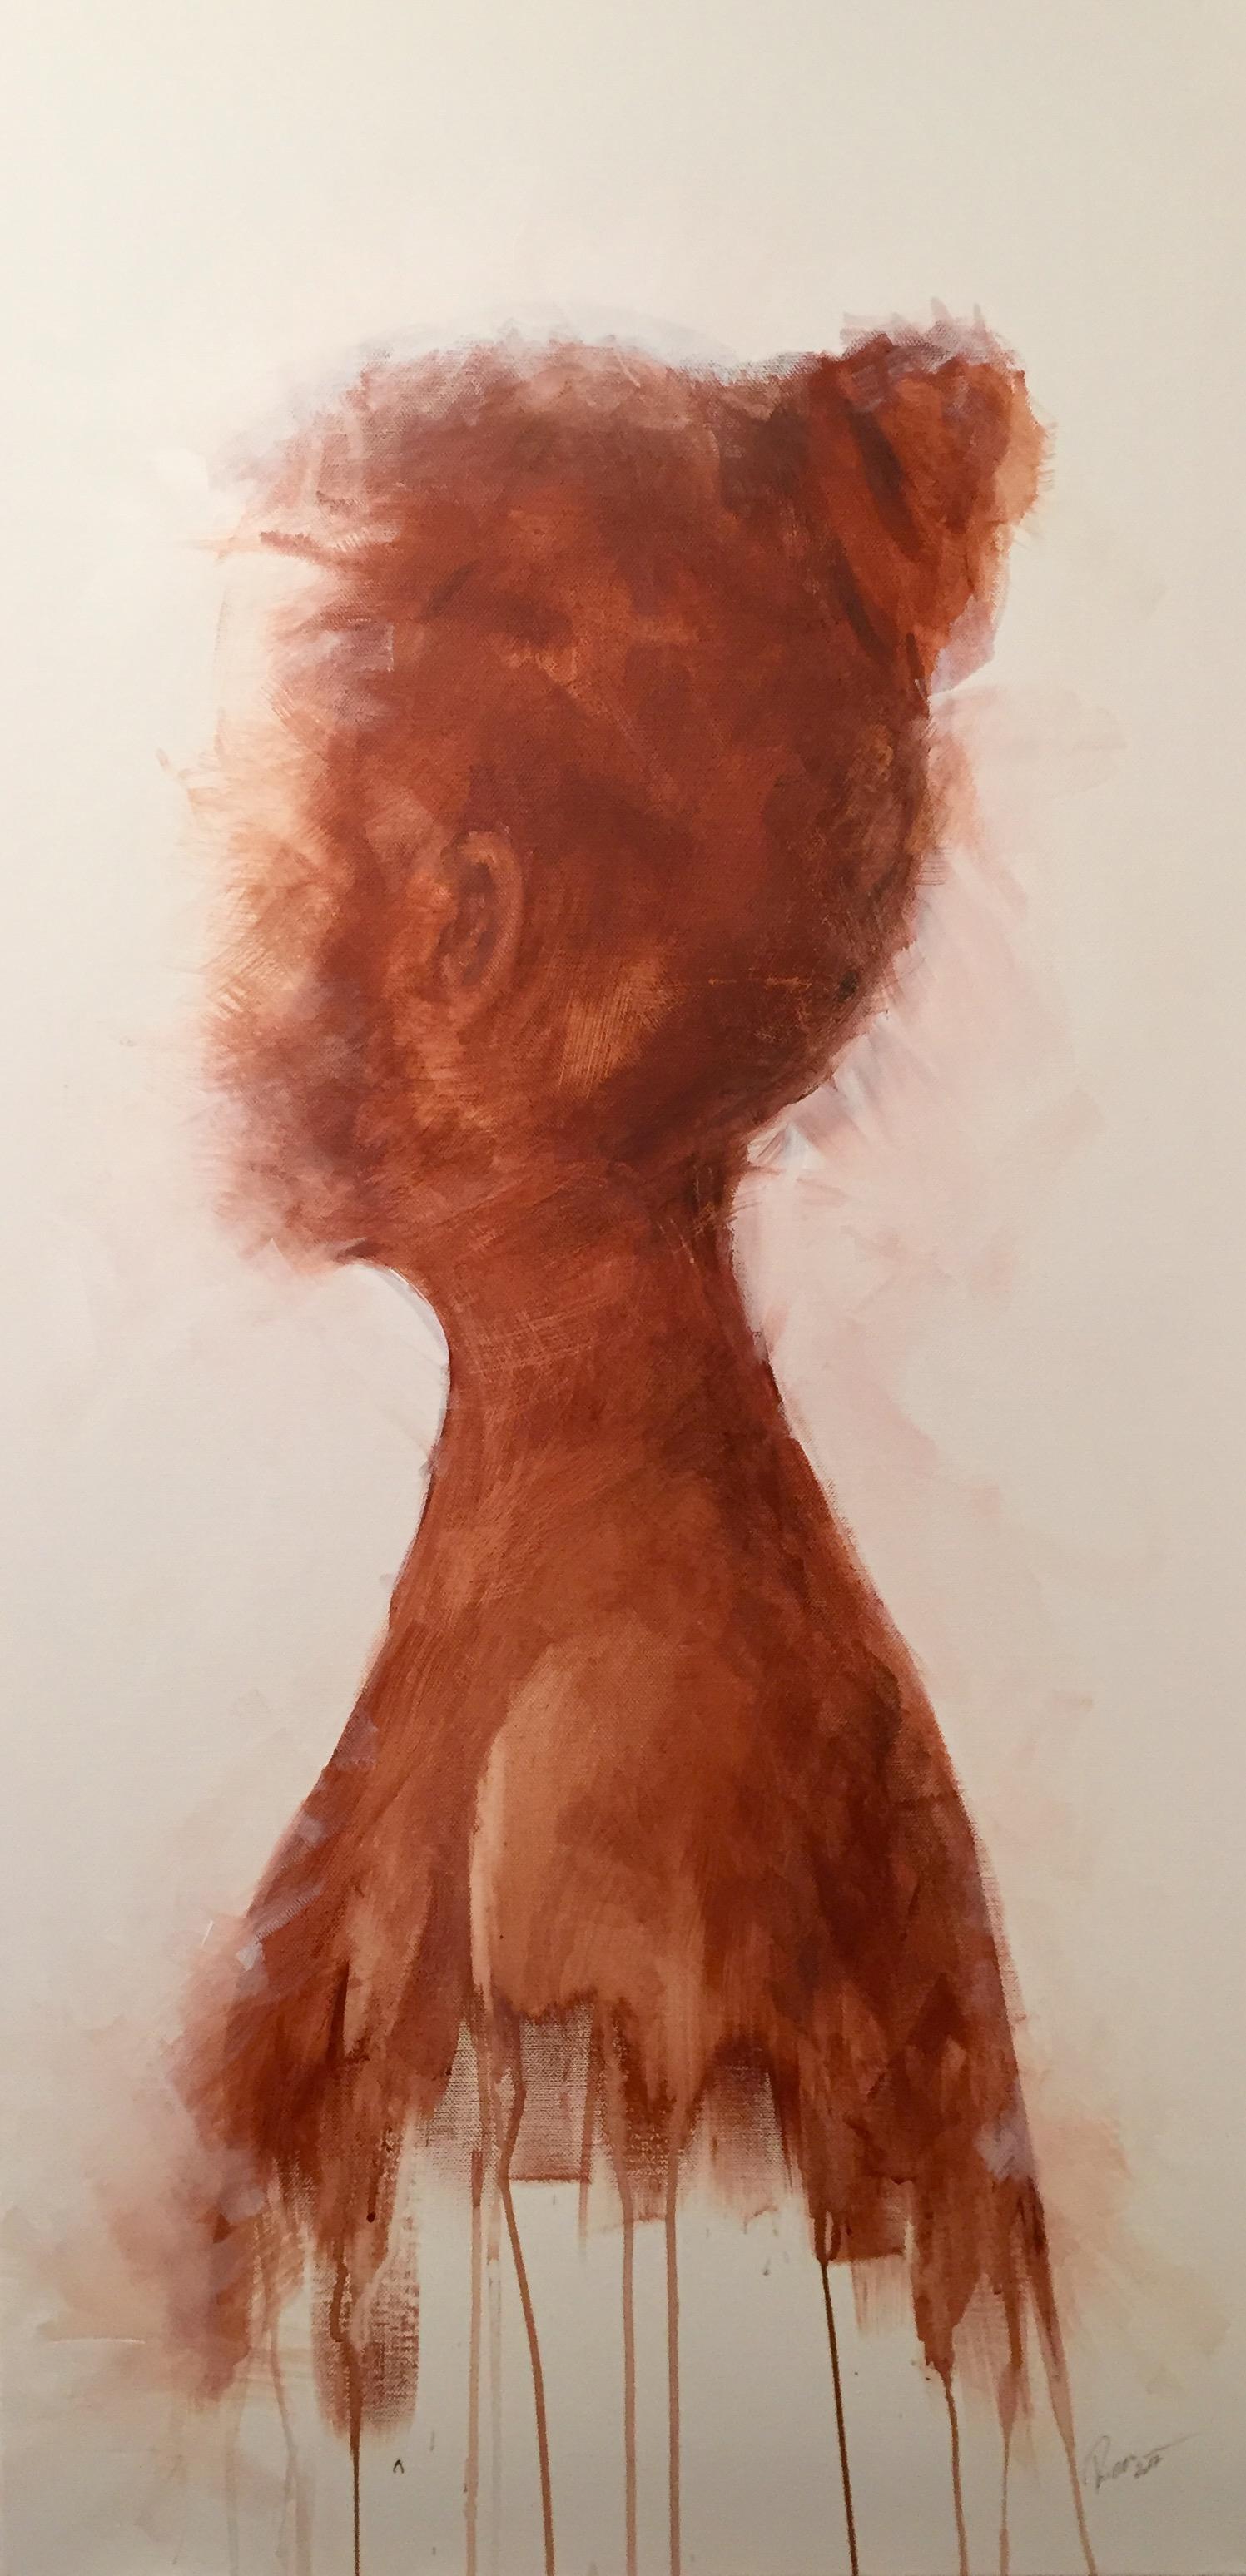 LA BAMBOLA /SONJA RIEMER ART